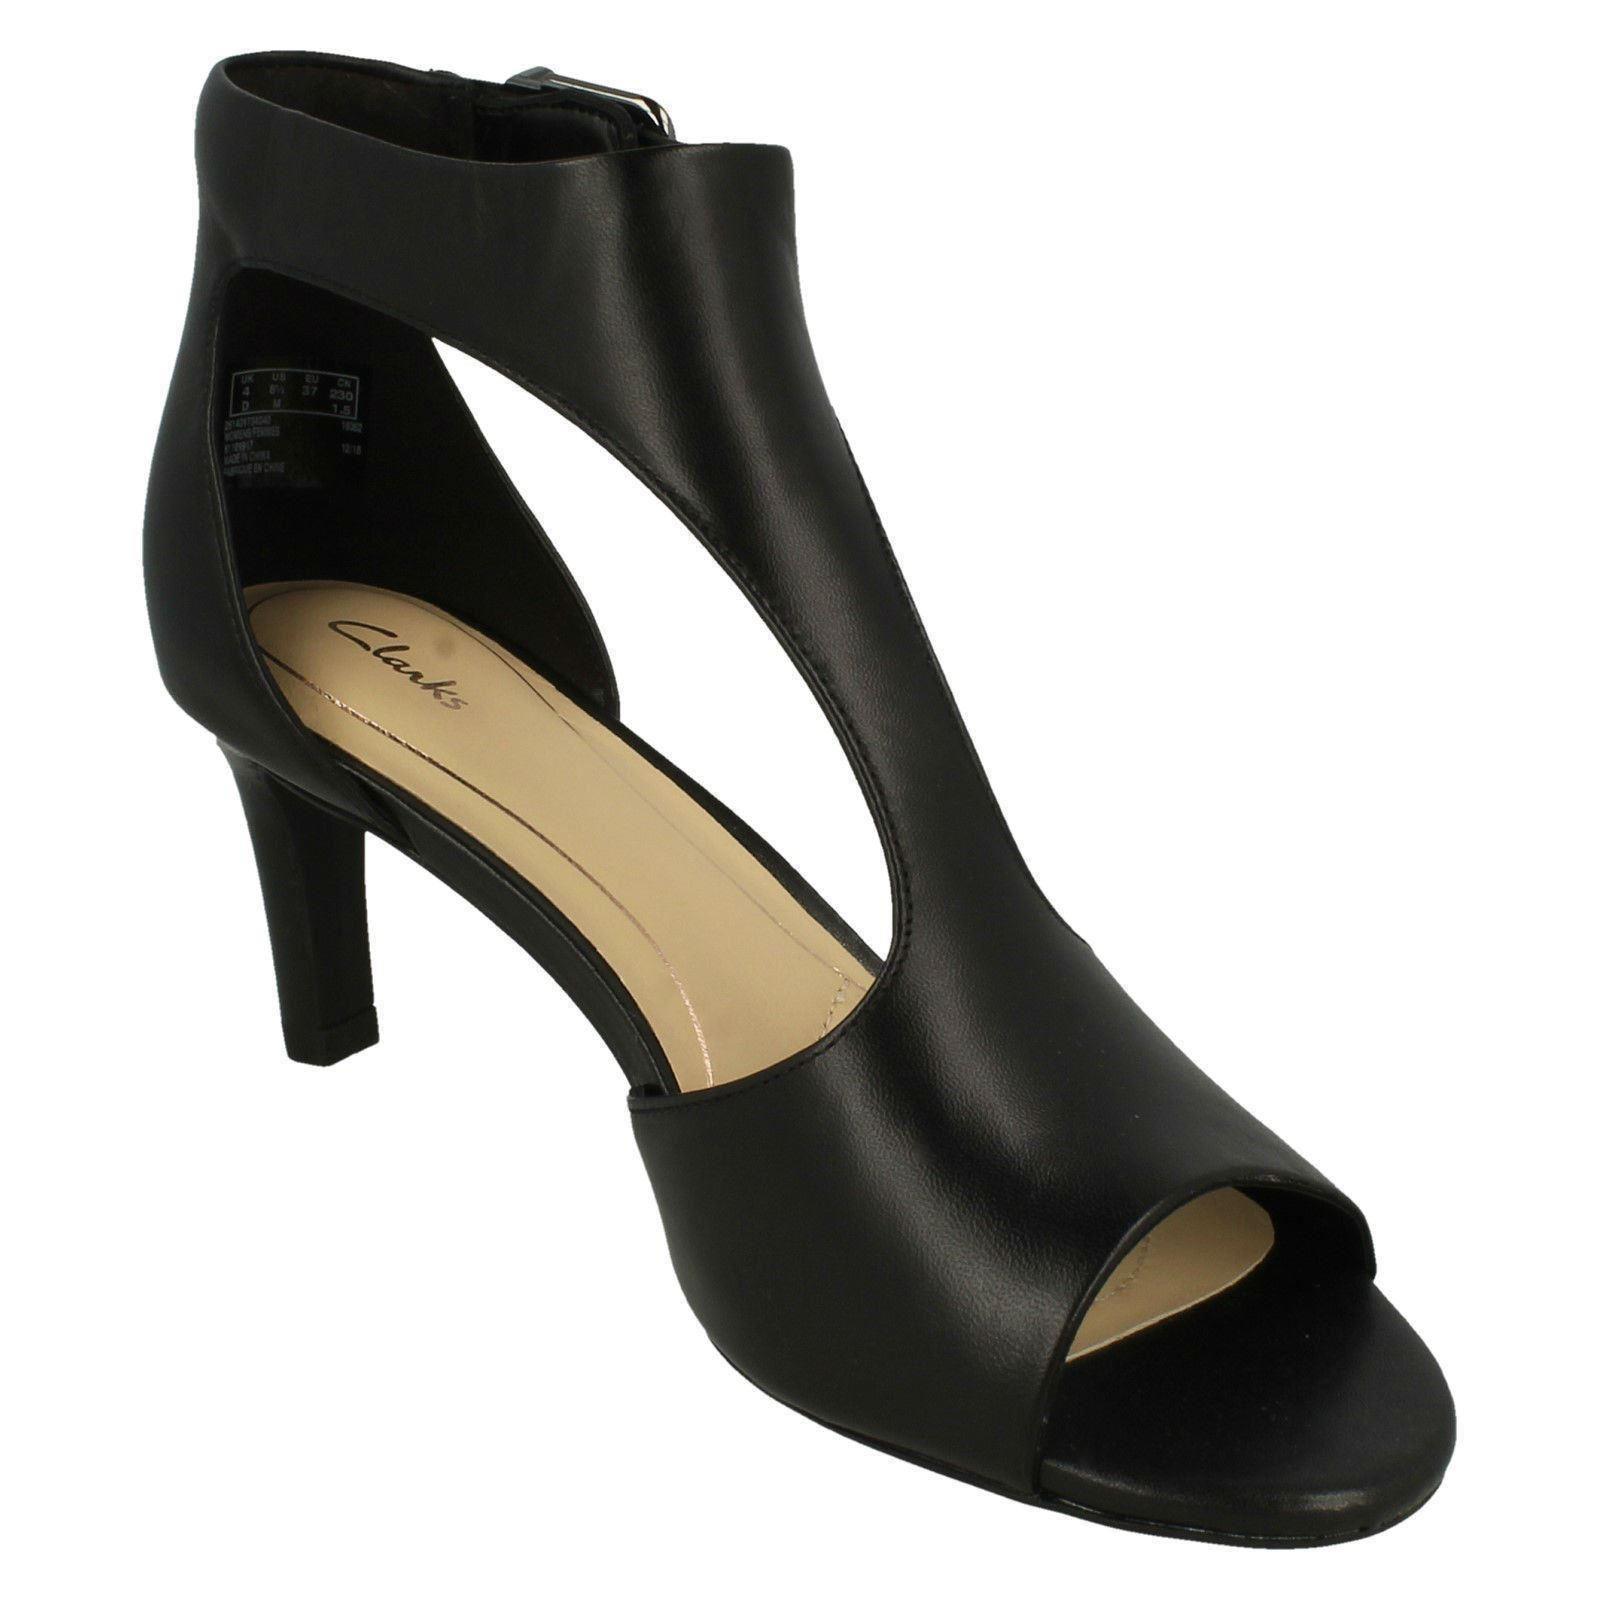 e4fac31034c8 Ladies Clarks Peep Toe Heeled Sandals Laureti Star